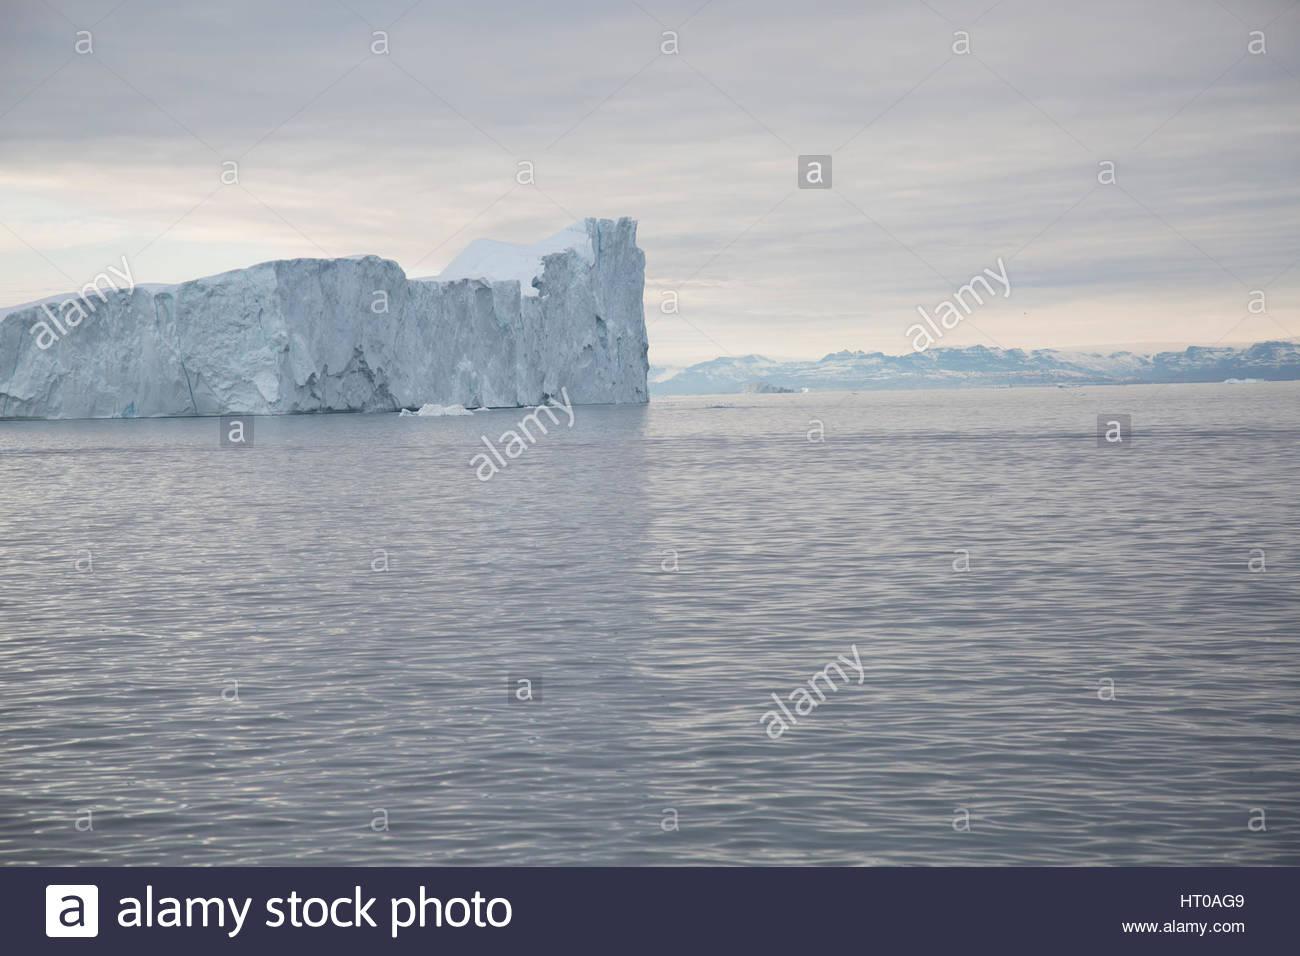 Sea of Iceberg Greenland Overcast Distant Disko Bay - Stock Image